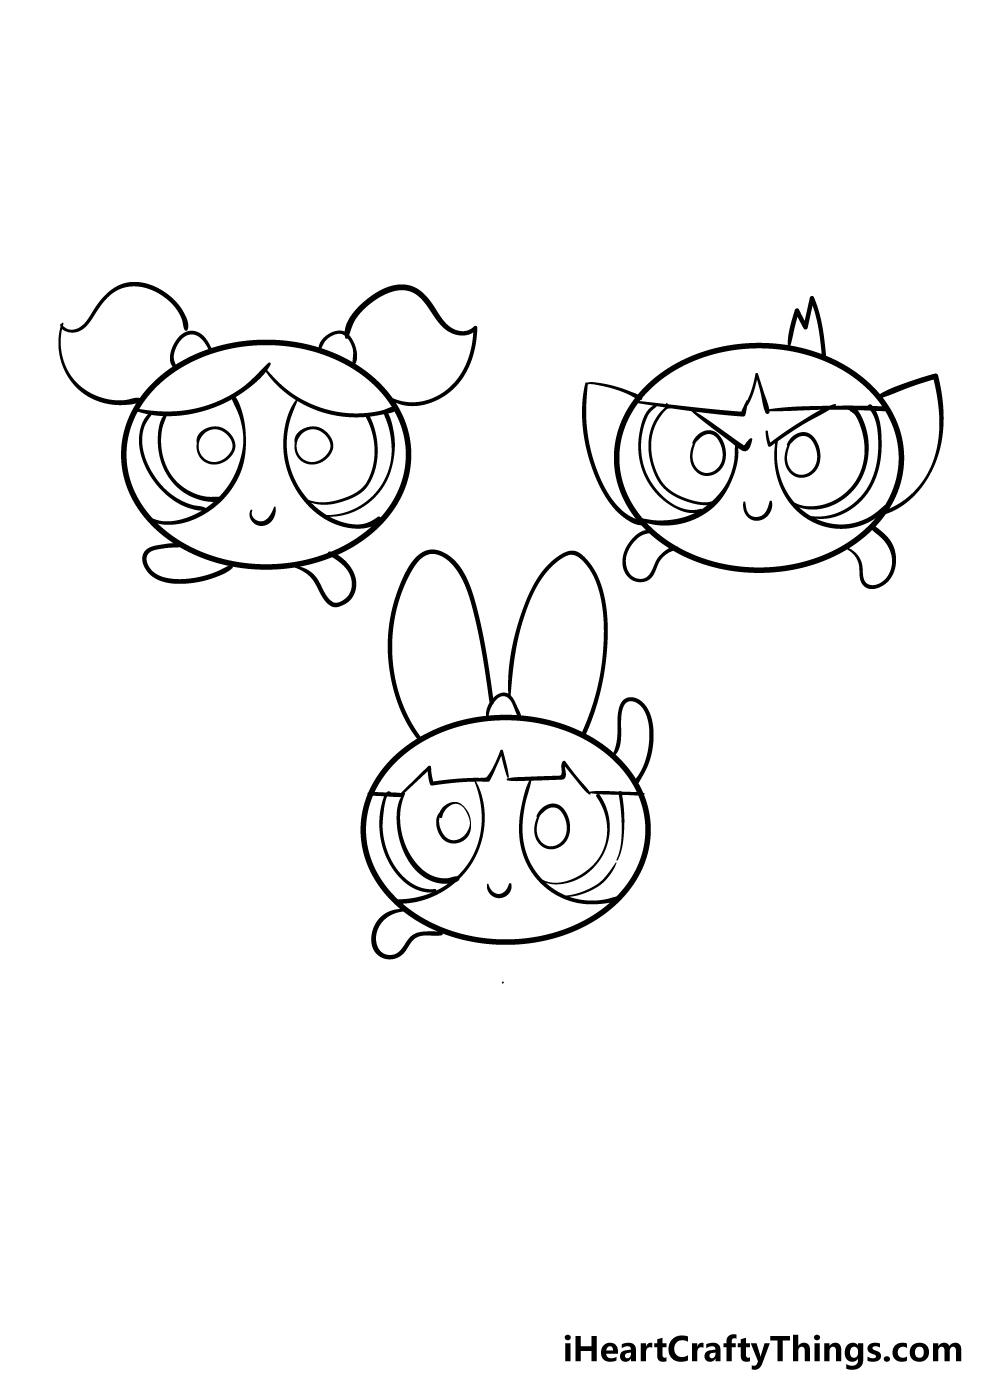 powerpuff girls drawing step 5